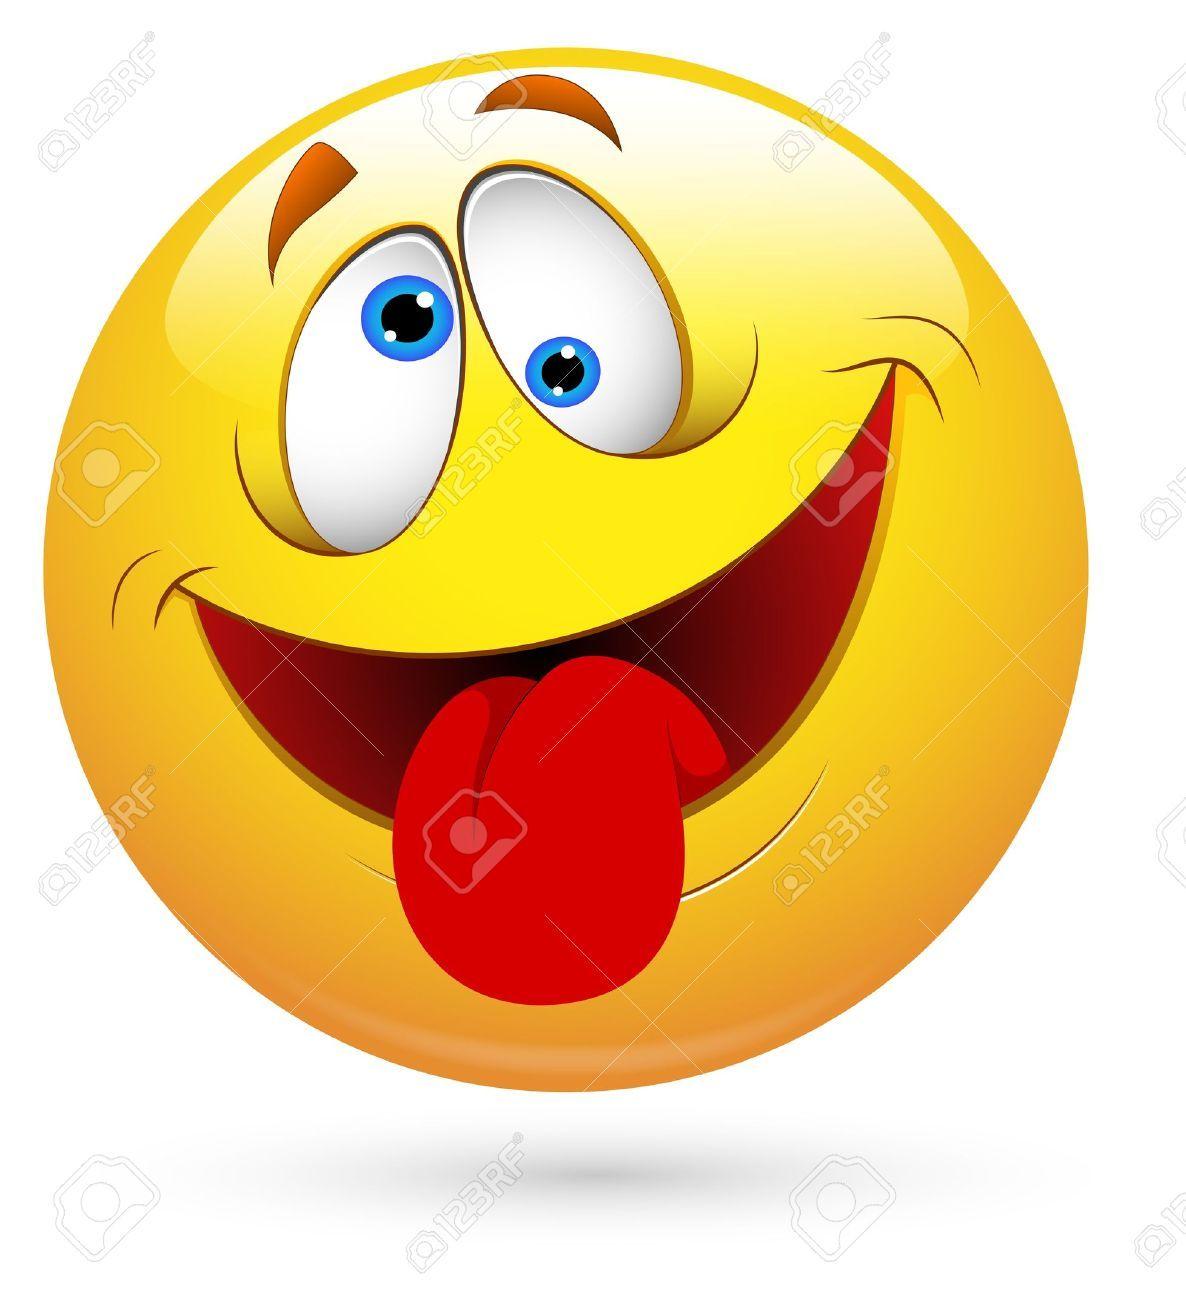 Smiley Illustration Vecteur Langue Out Emoji Drole Emoticone Gratuit Smileys